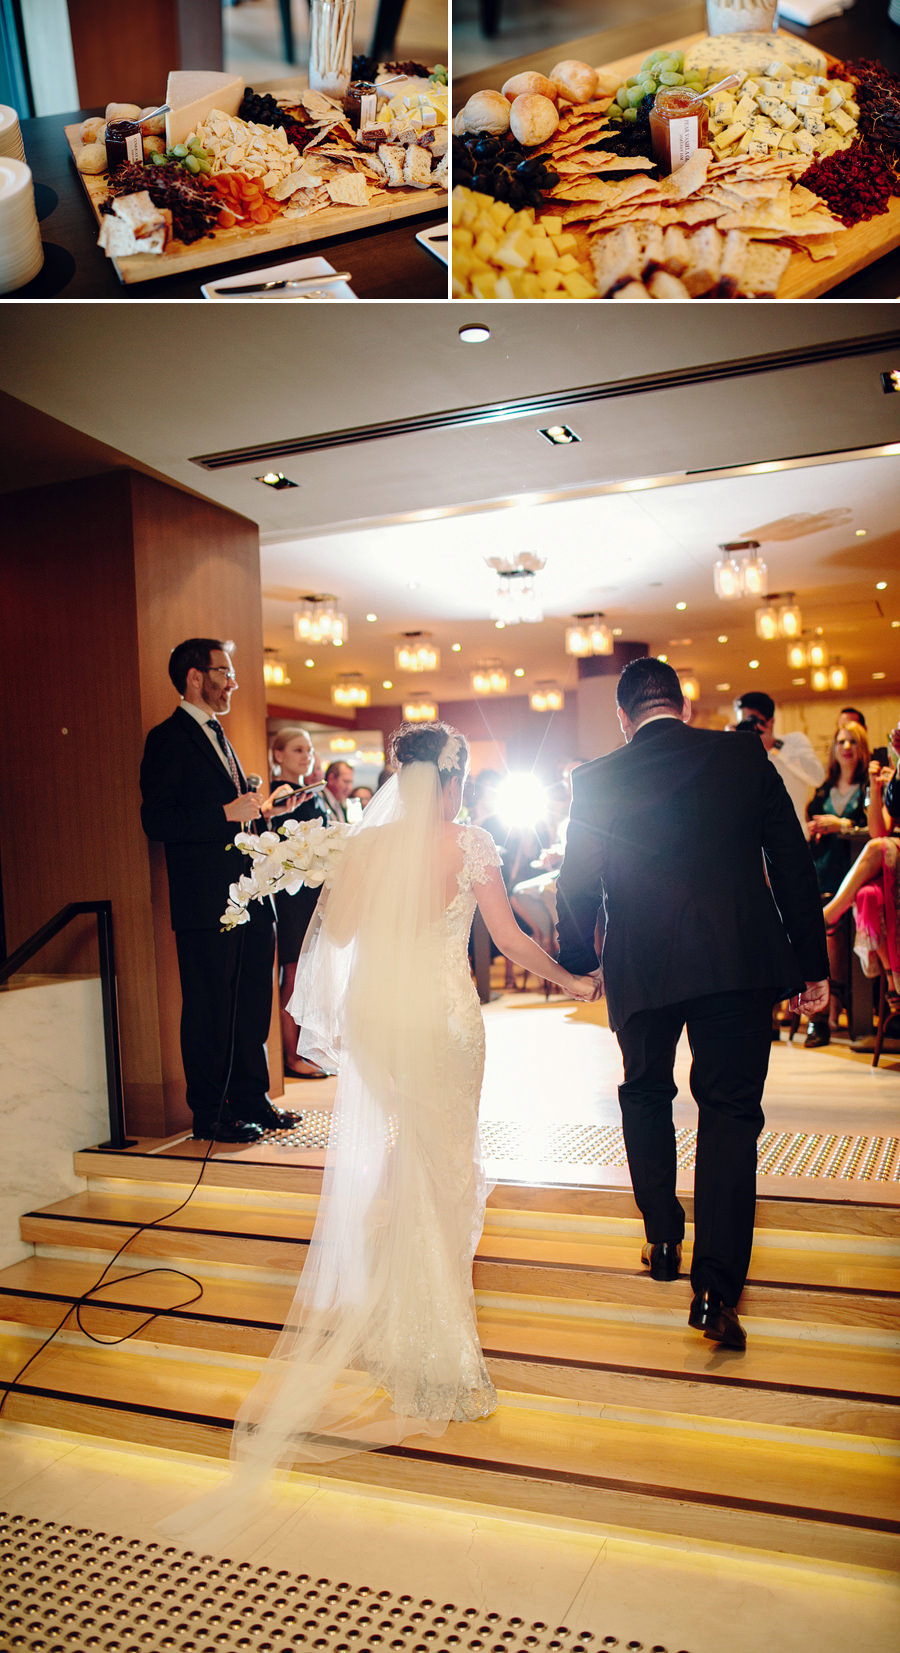 Park Hyatt Wedding Photographers: Reception